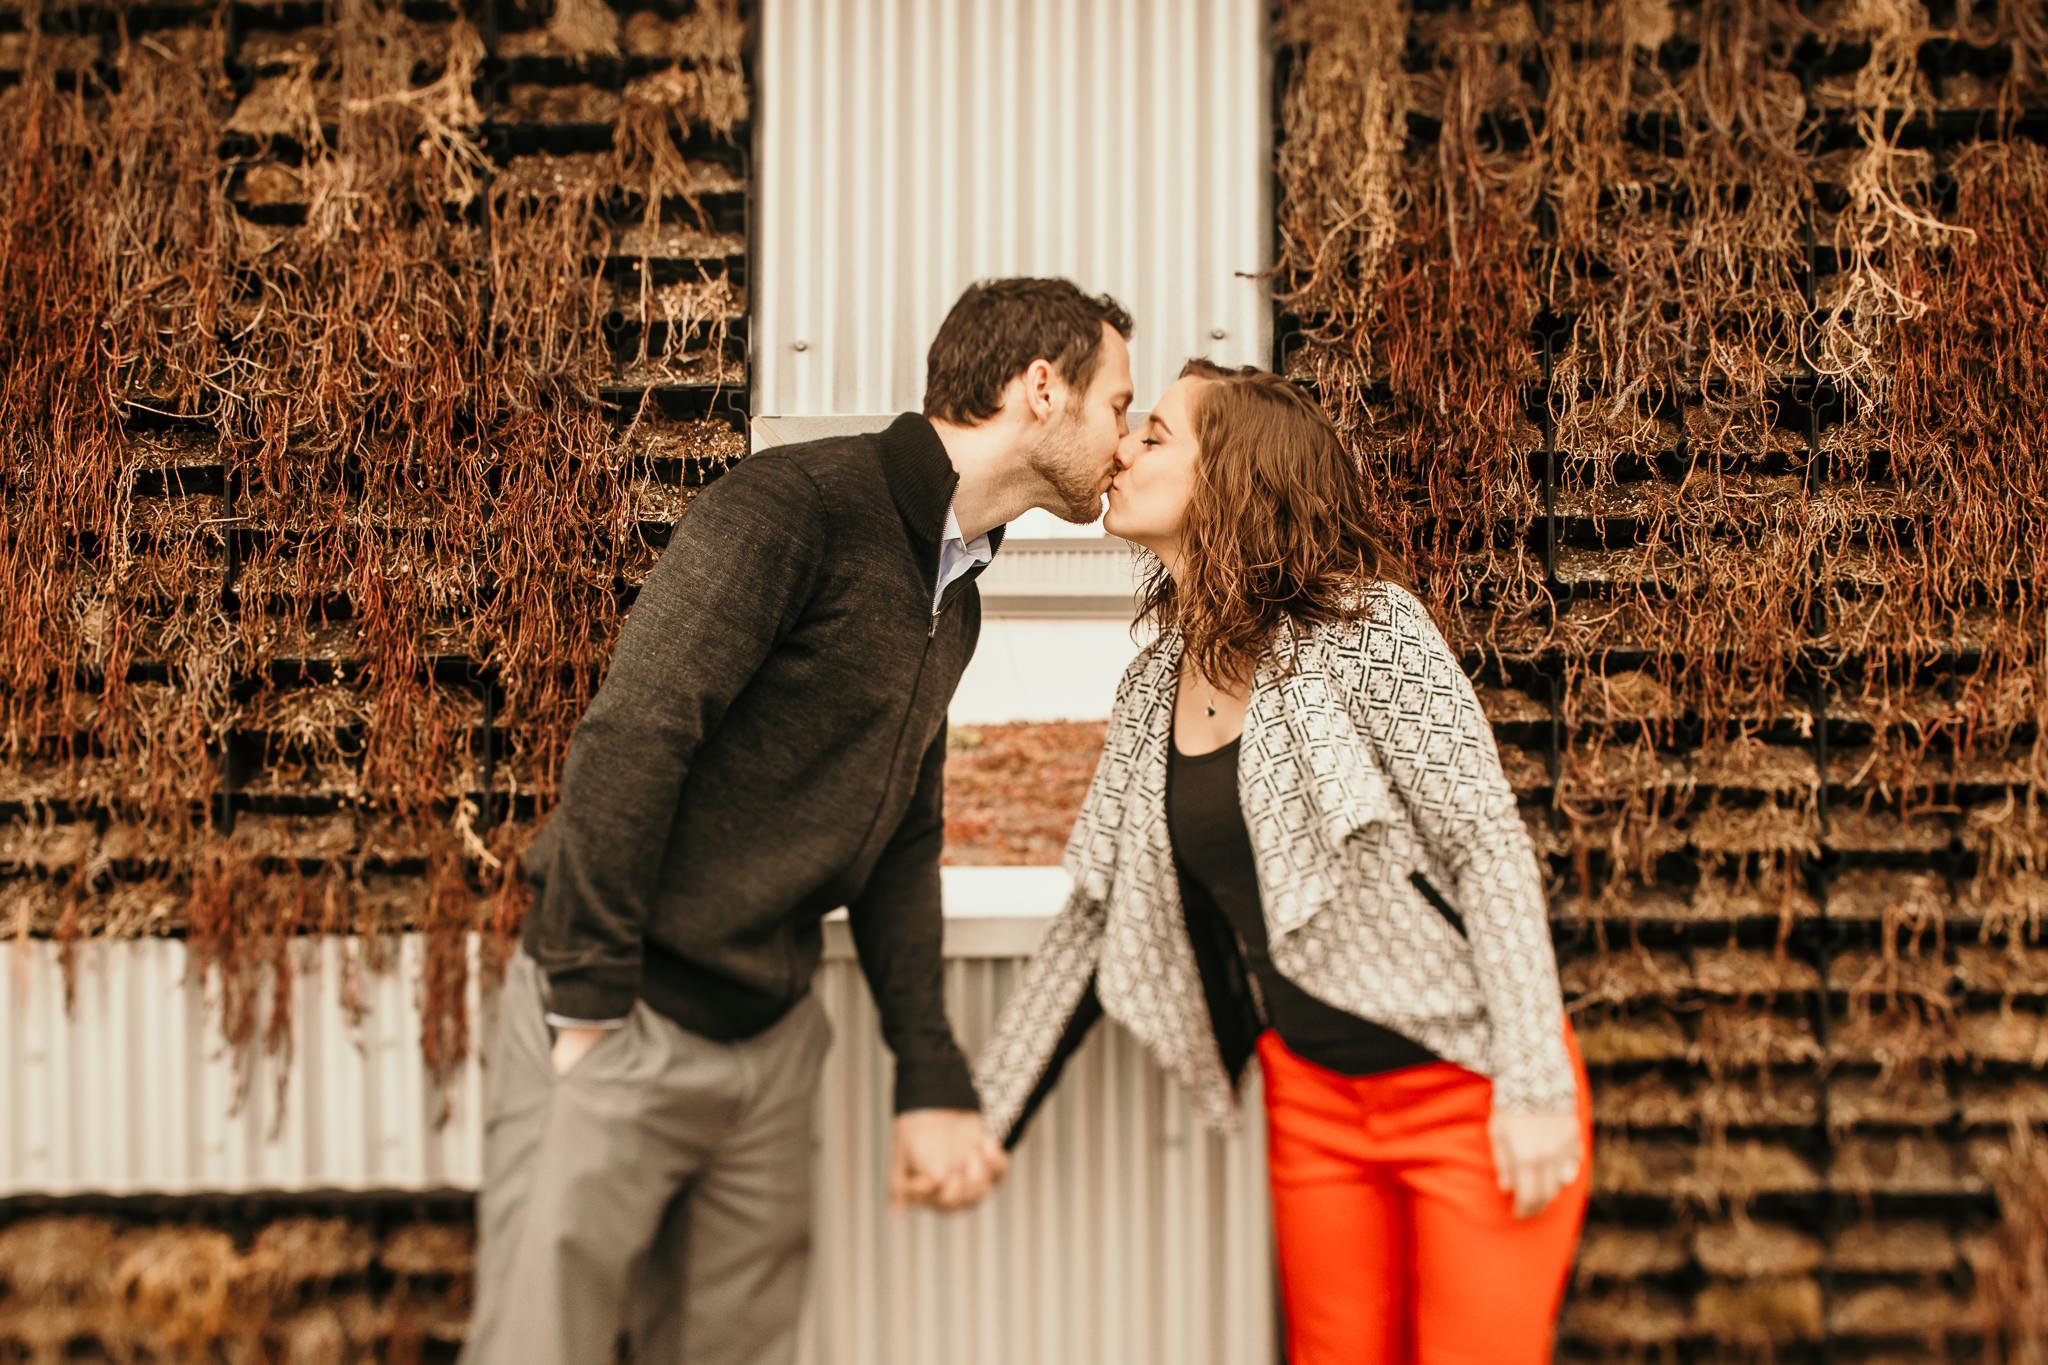 Engagement - Downtown Roanoke - Virginia - Wedding Photographer - Pat Cori Photography-3.jpg